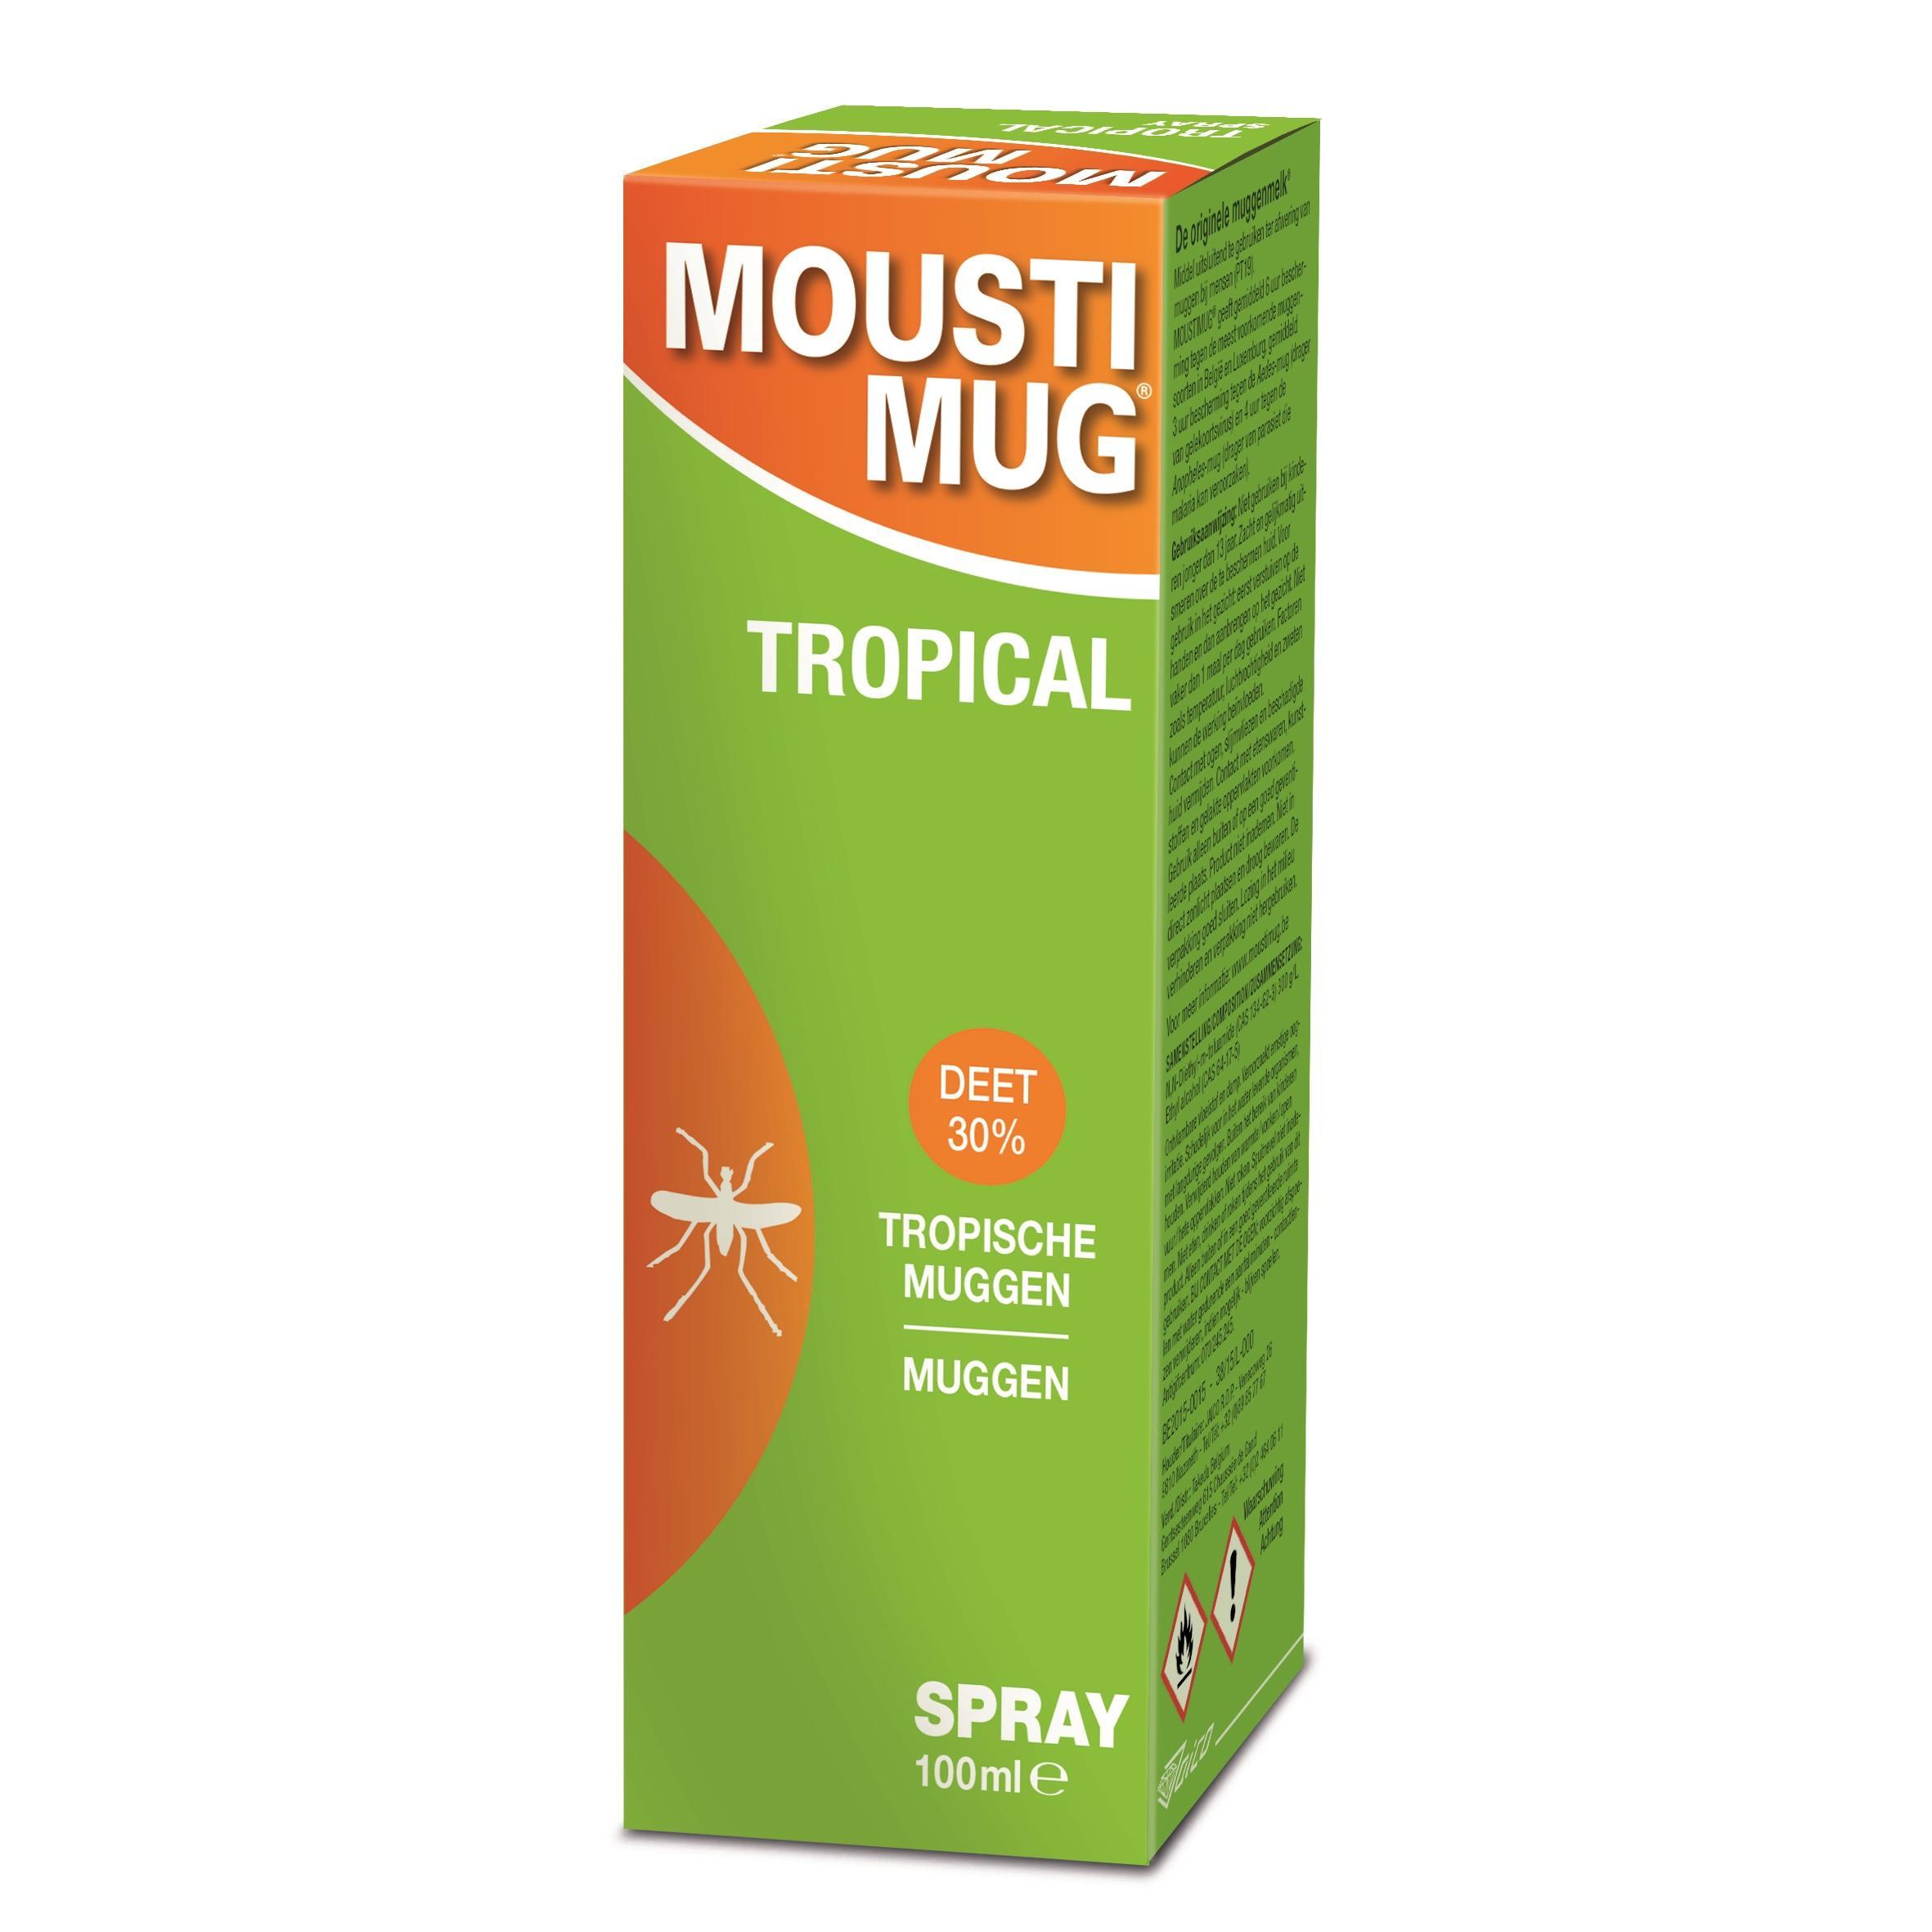 Image of Moustimug spray tropical